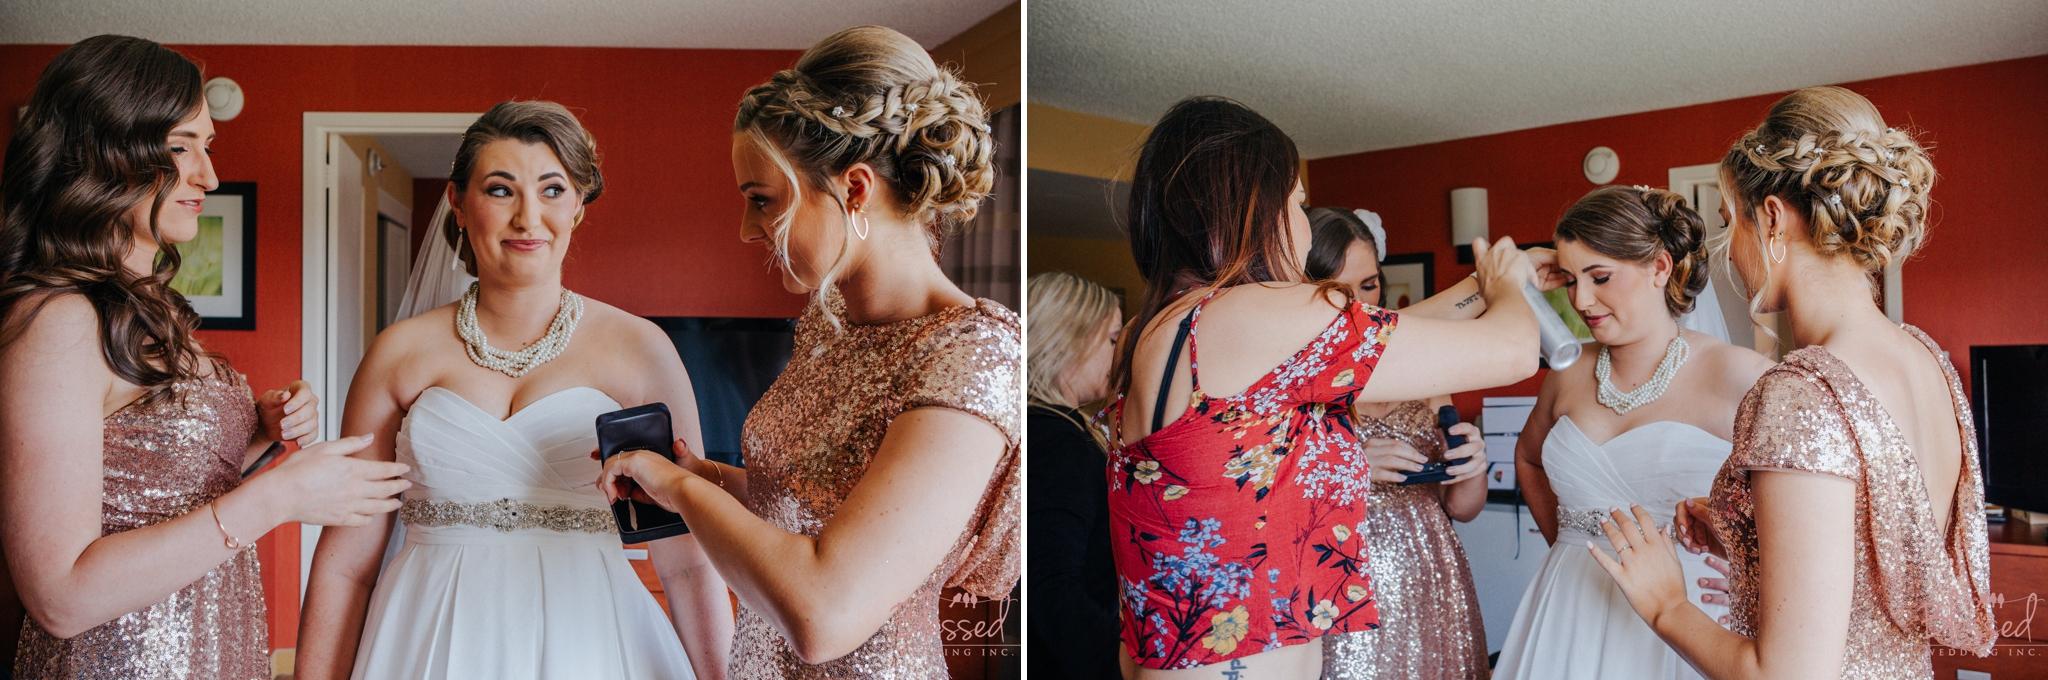 Orfila Vinery Wedding by Blessed Wedding Photography 17.jpg